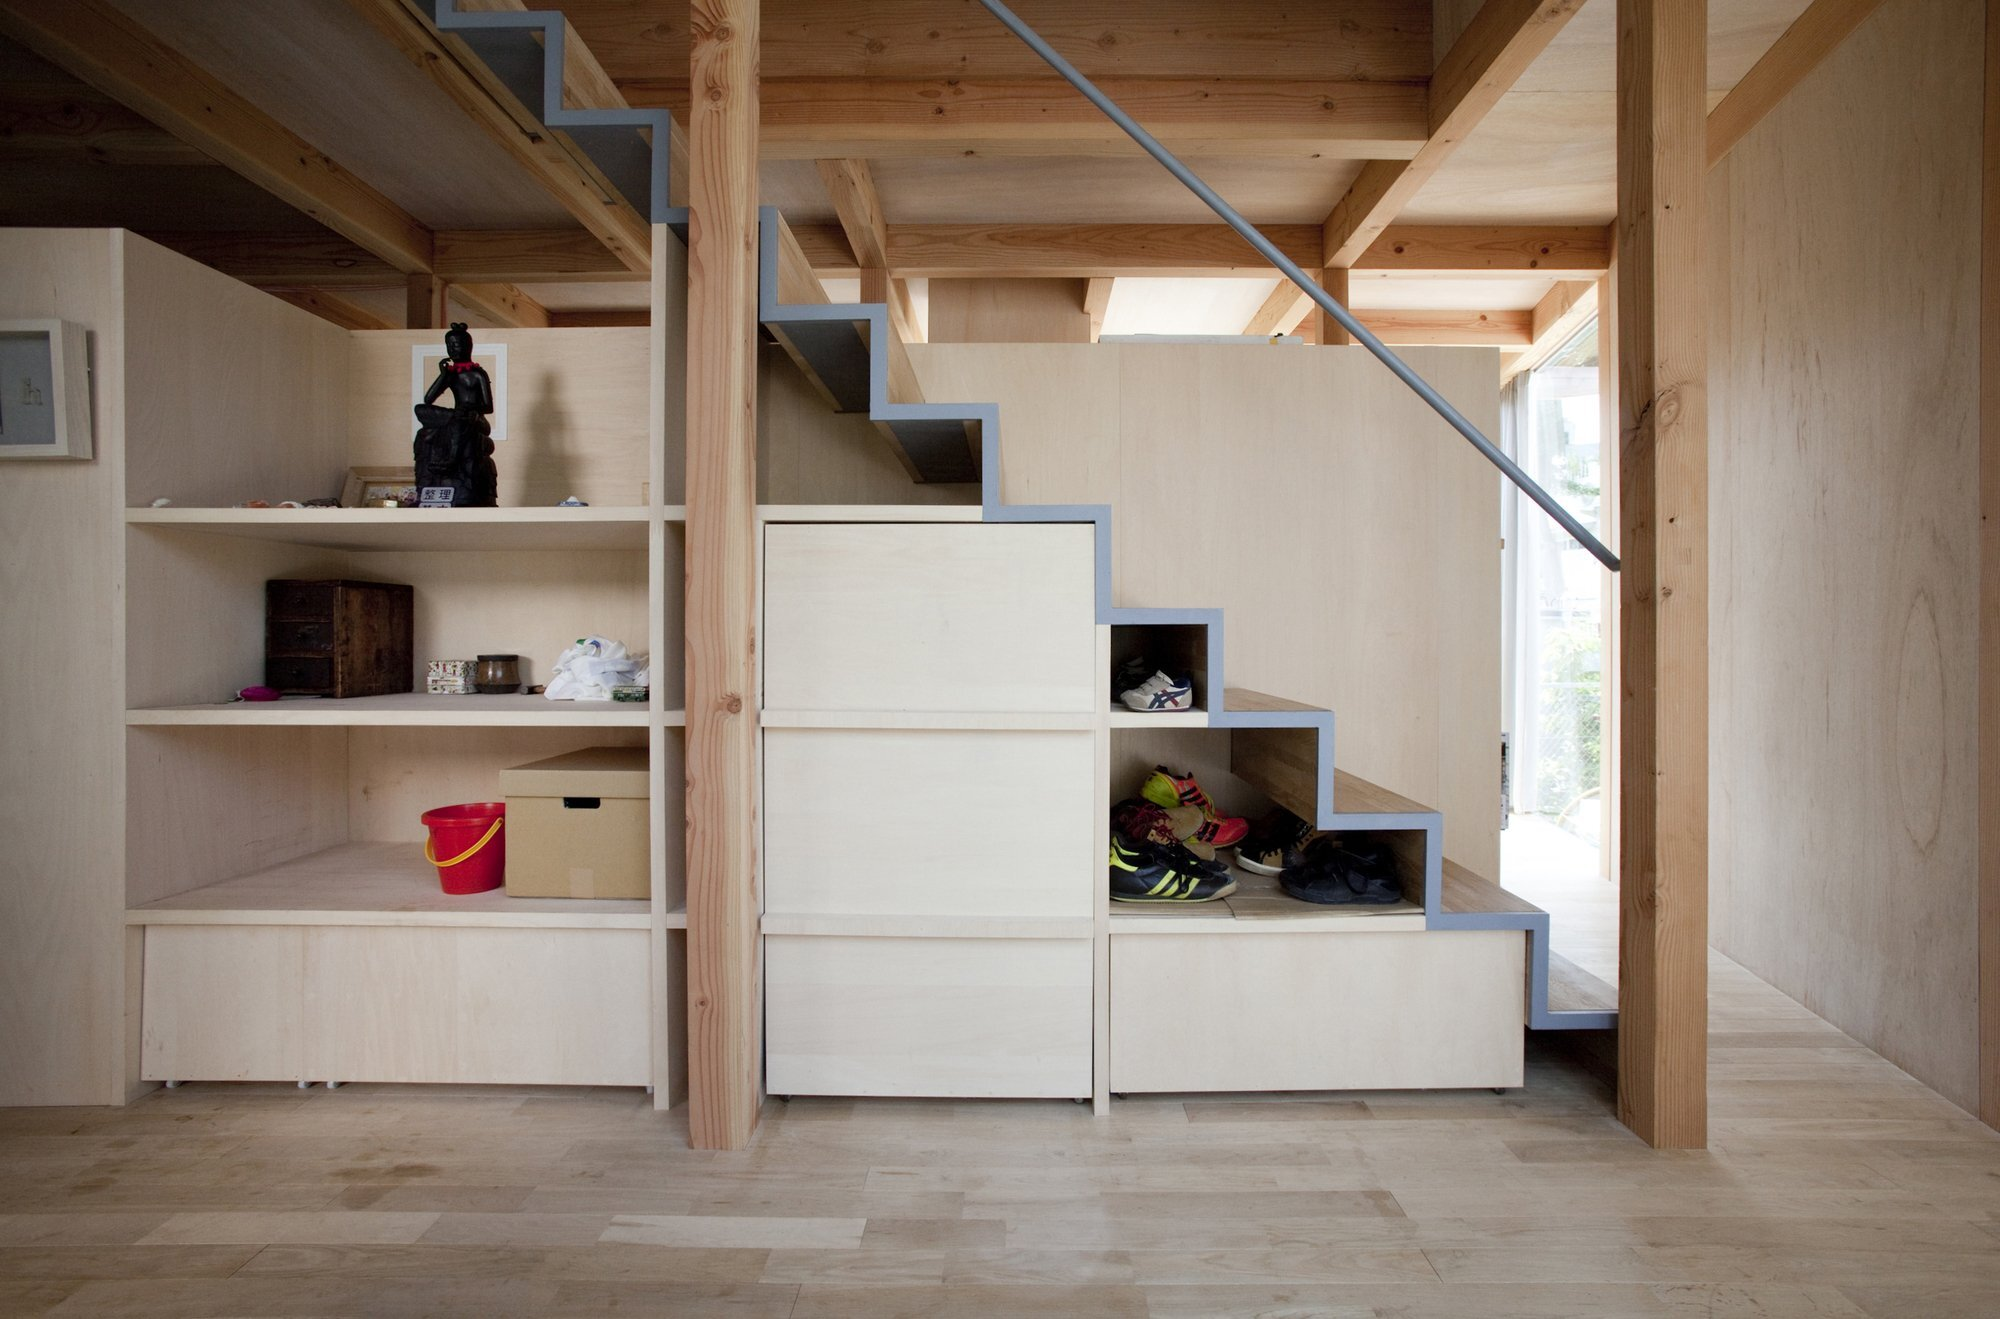 Double Circular Rings - Todoroki - Teppei Fujiwara Architects Labo - Small House Japan - Stairs and Storage - Humble Homes